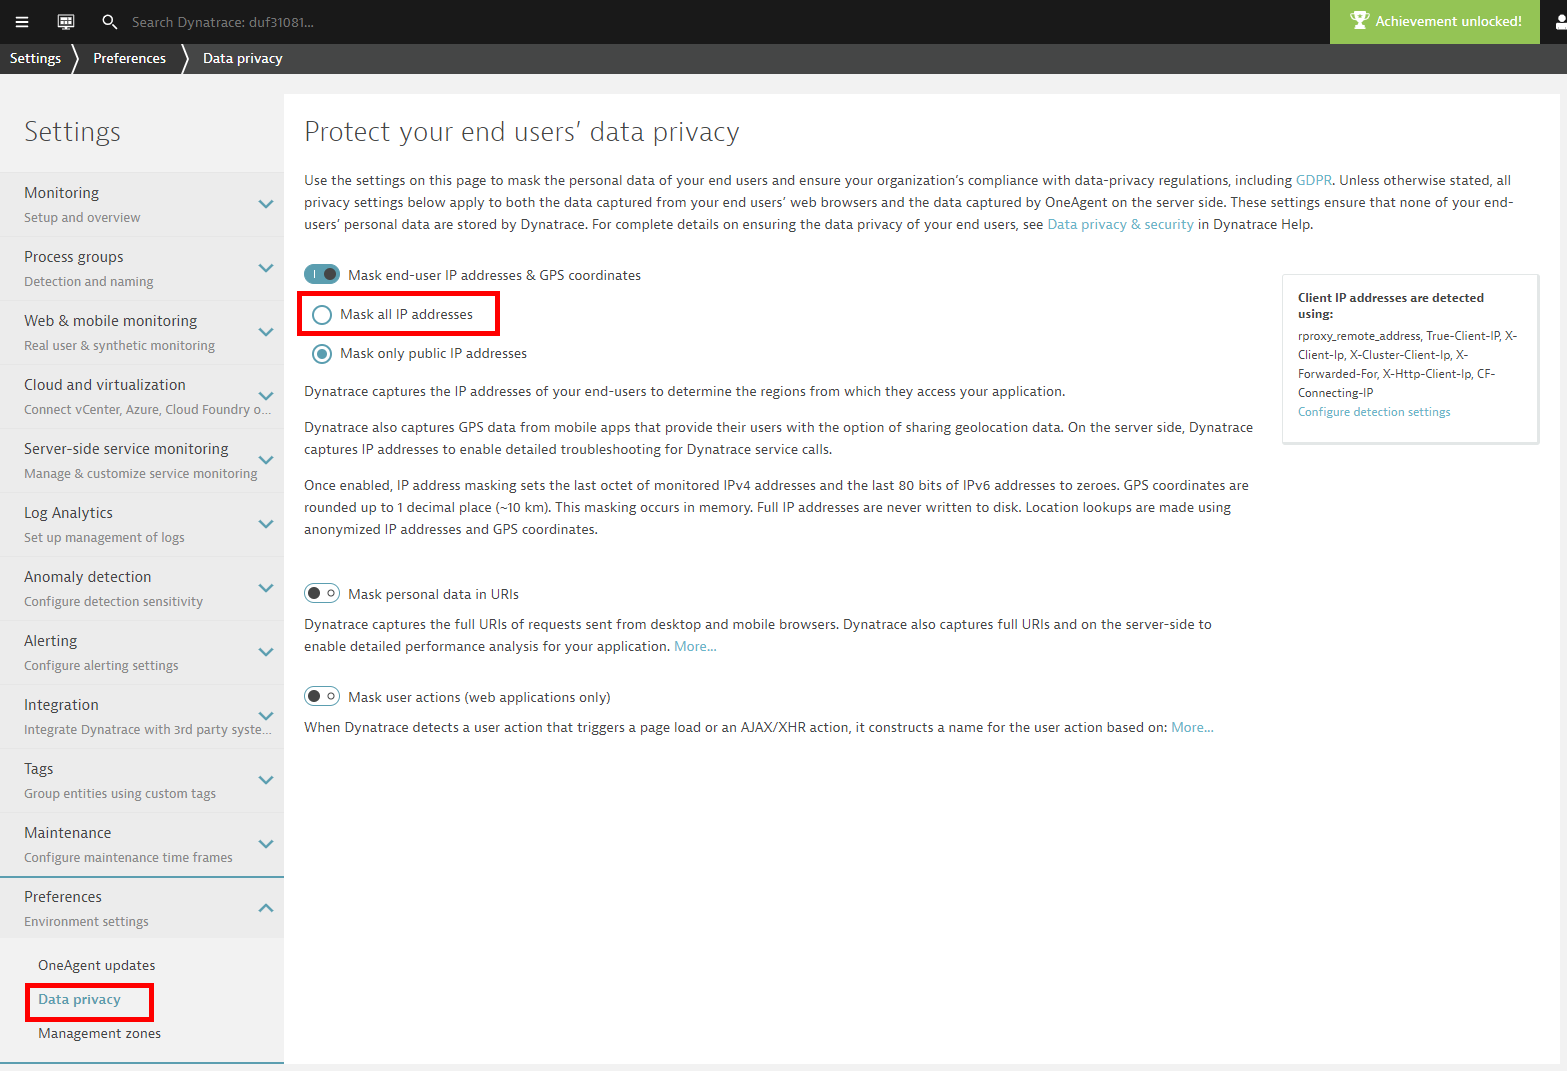 Data privacy settings for IP address masking